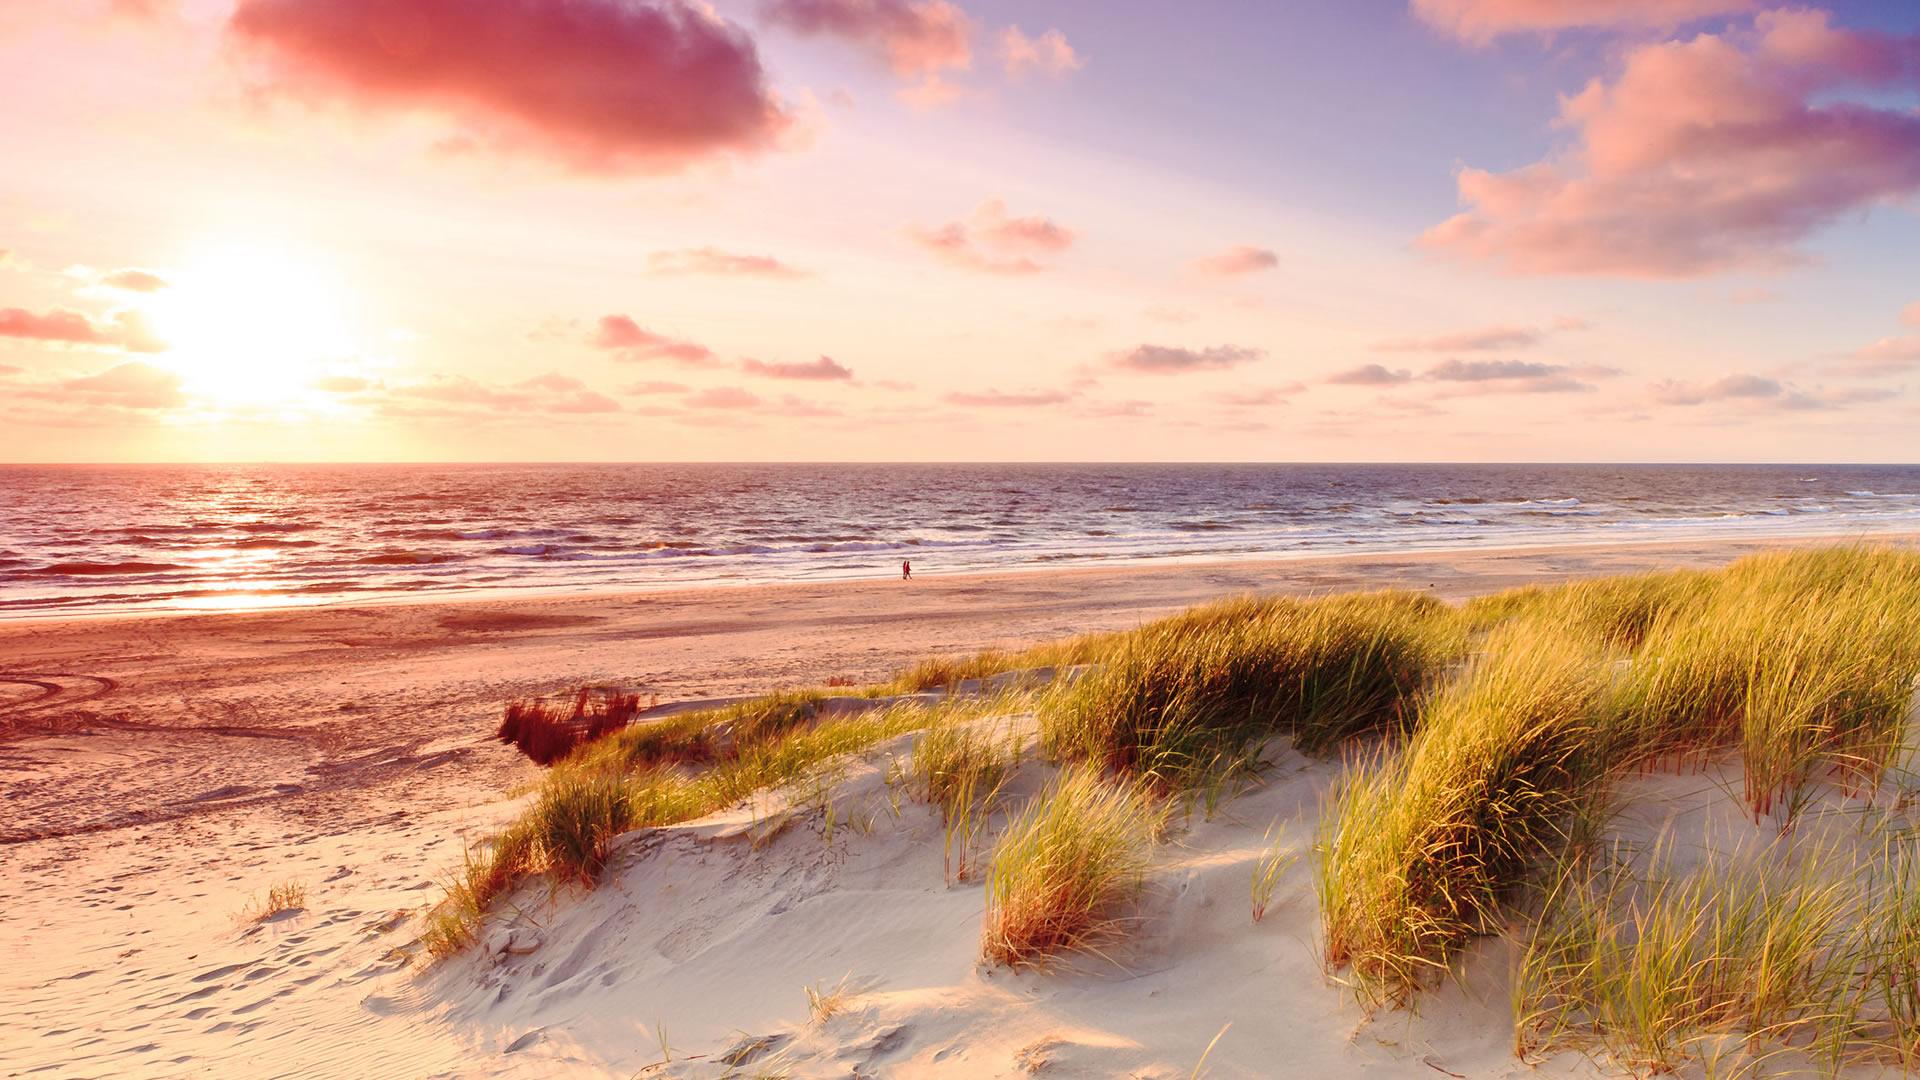 praia do guincho.jpg